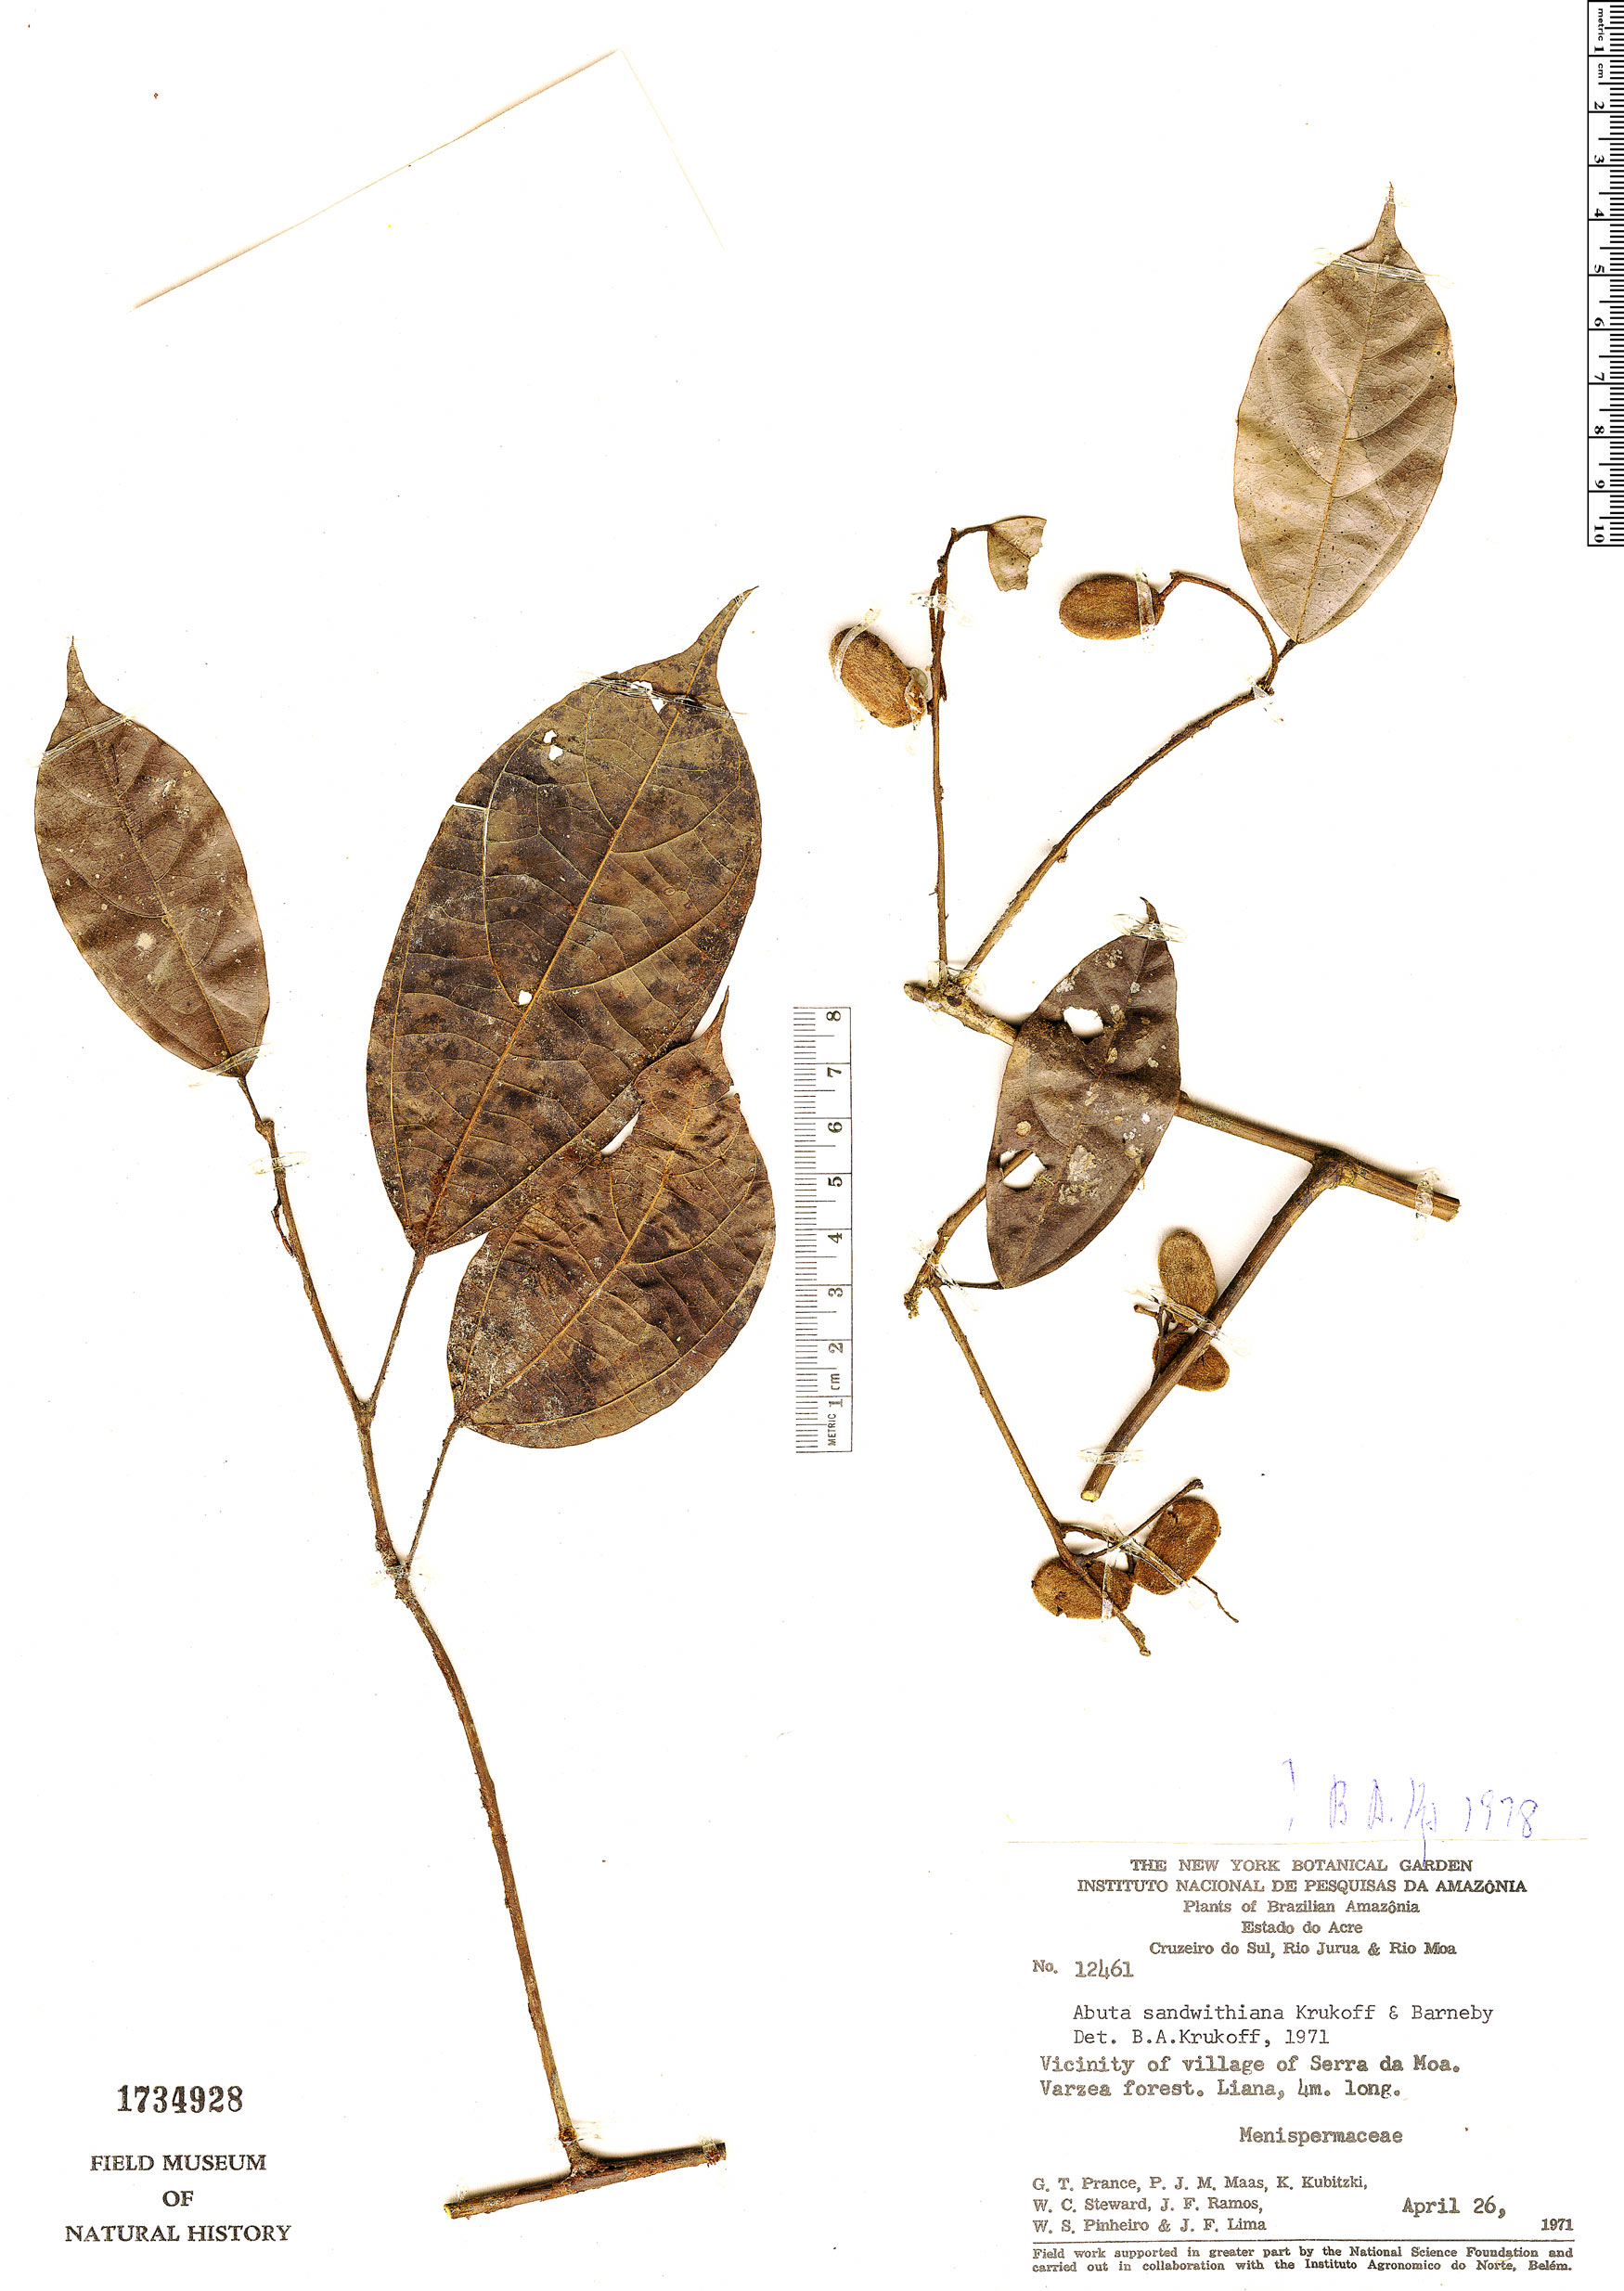 Espécimen: Abuta sandwithiana